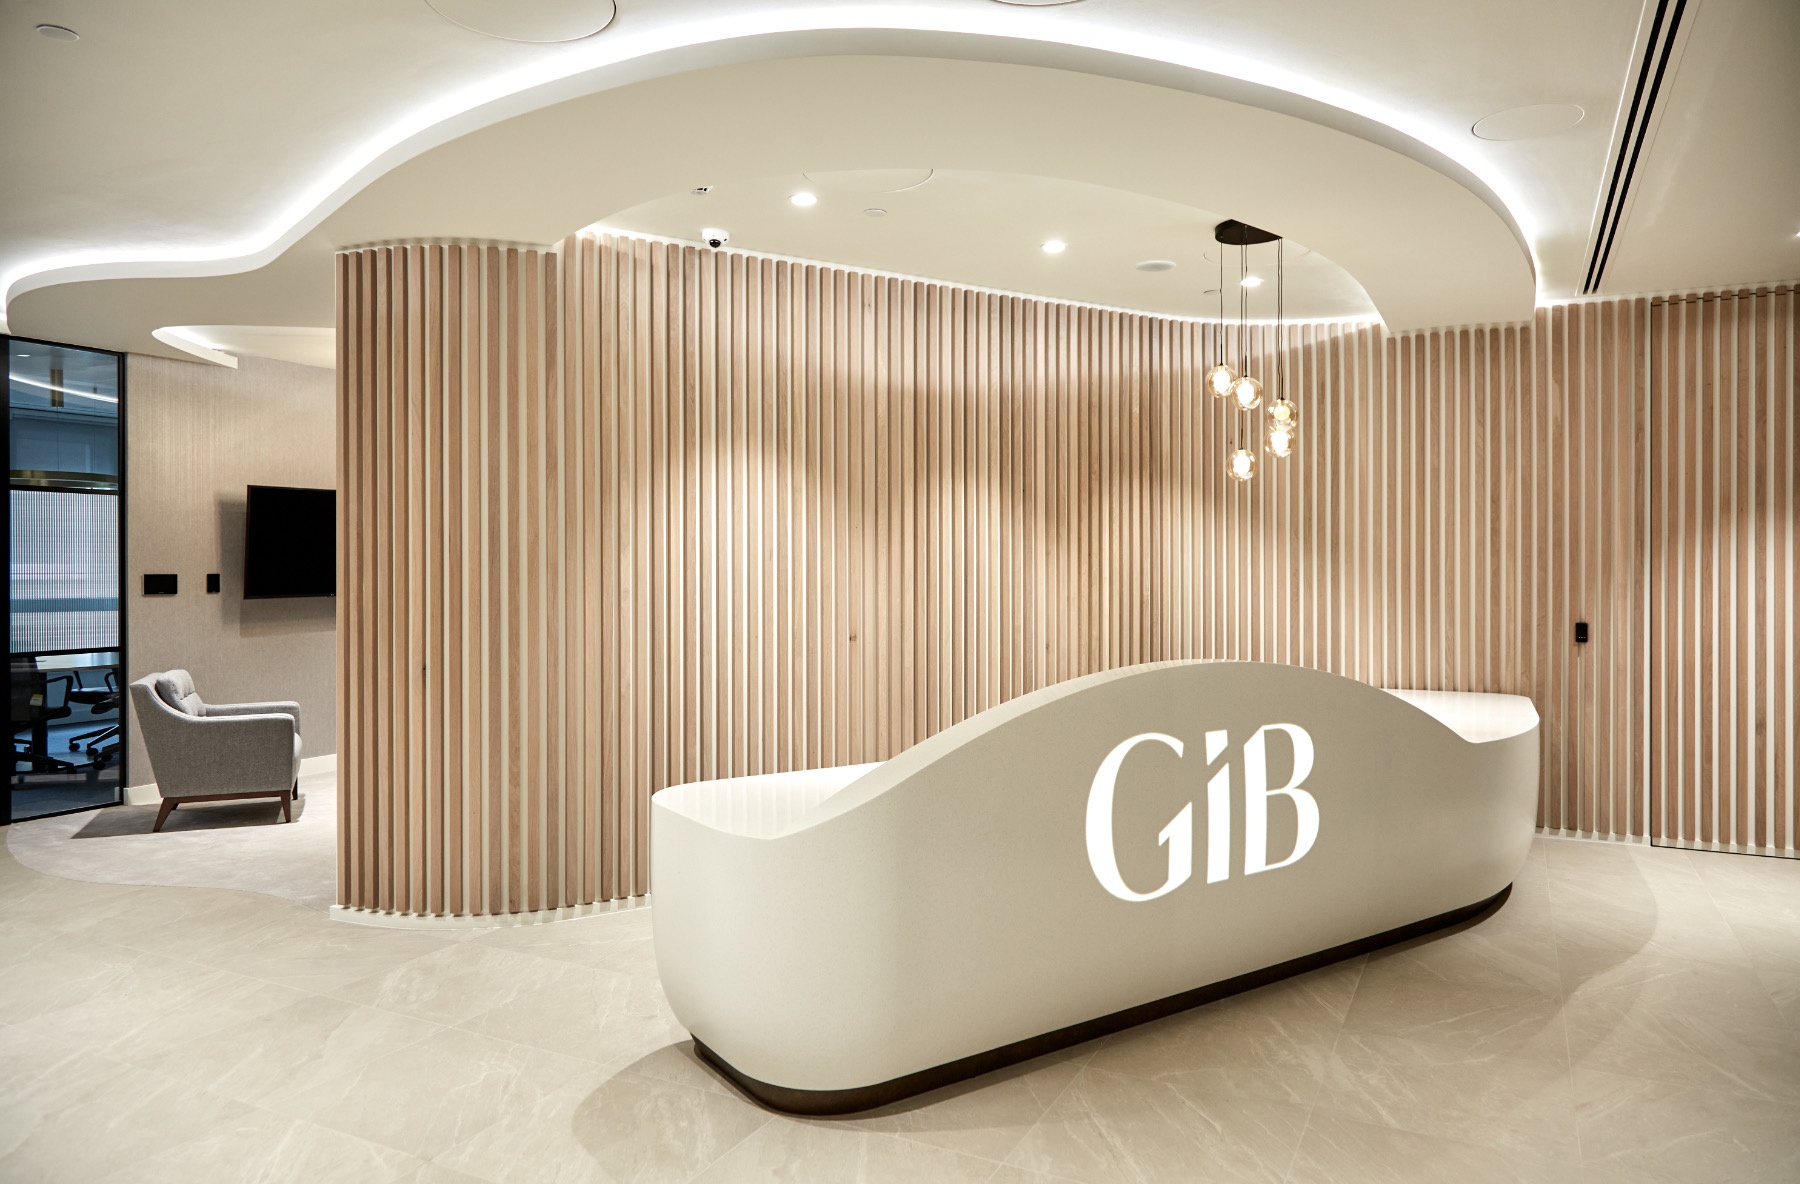 A Look Inside GIB Asset Management's New London Office